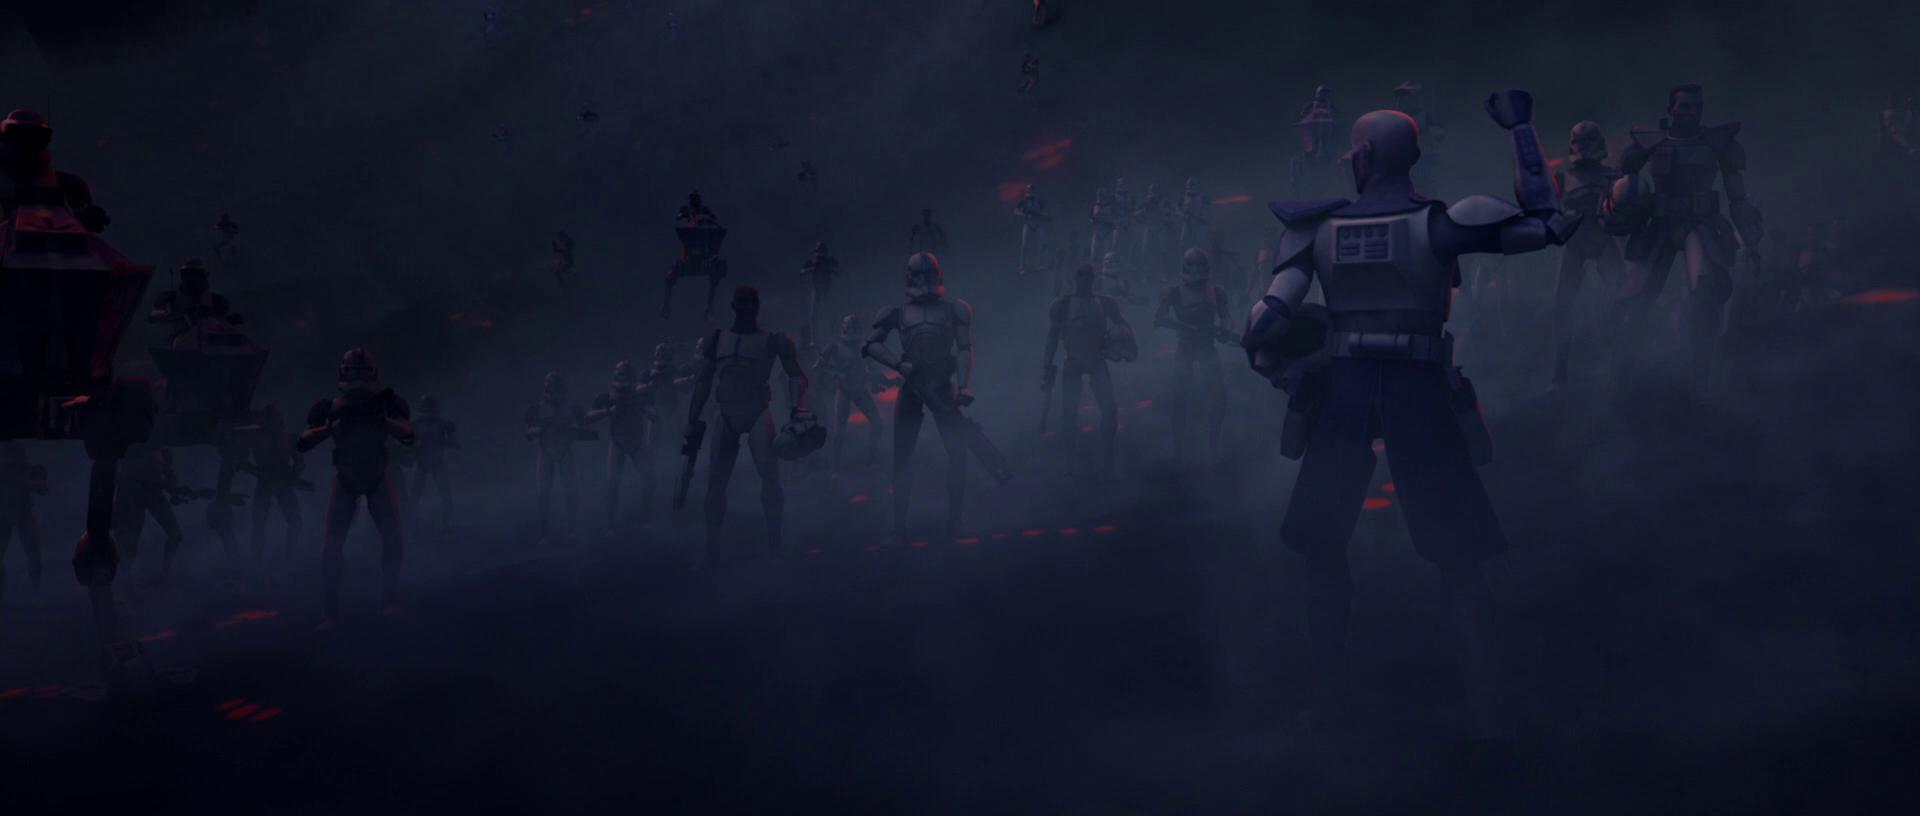 501st Legion - Clone Trooper Wiki